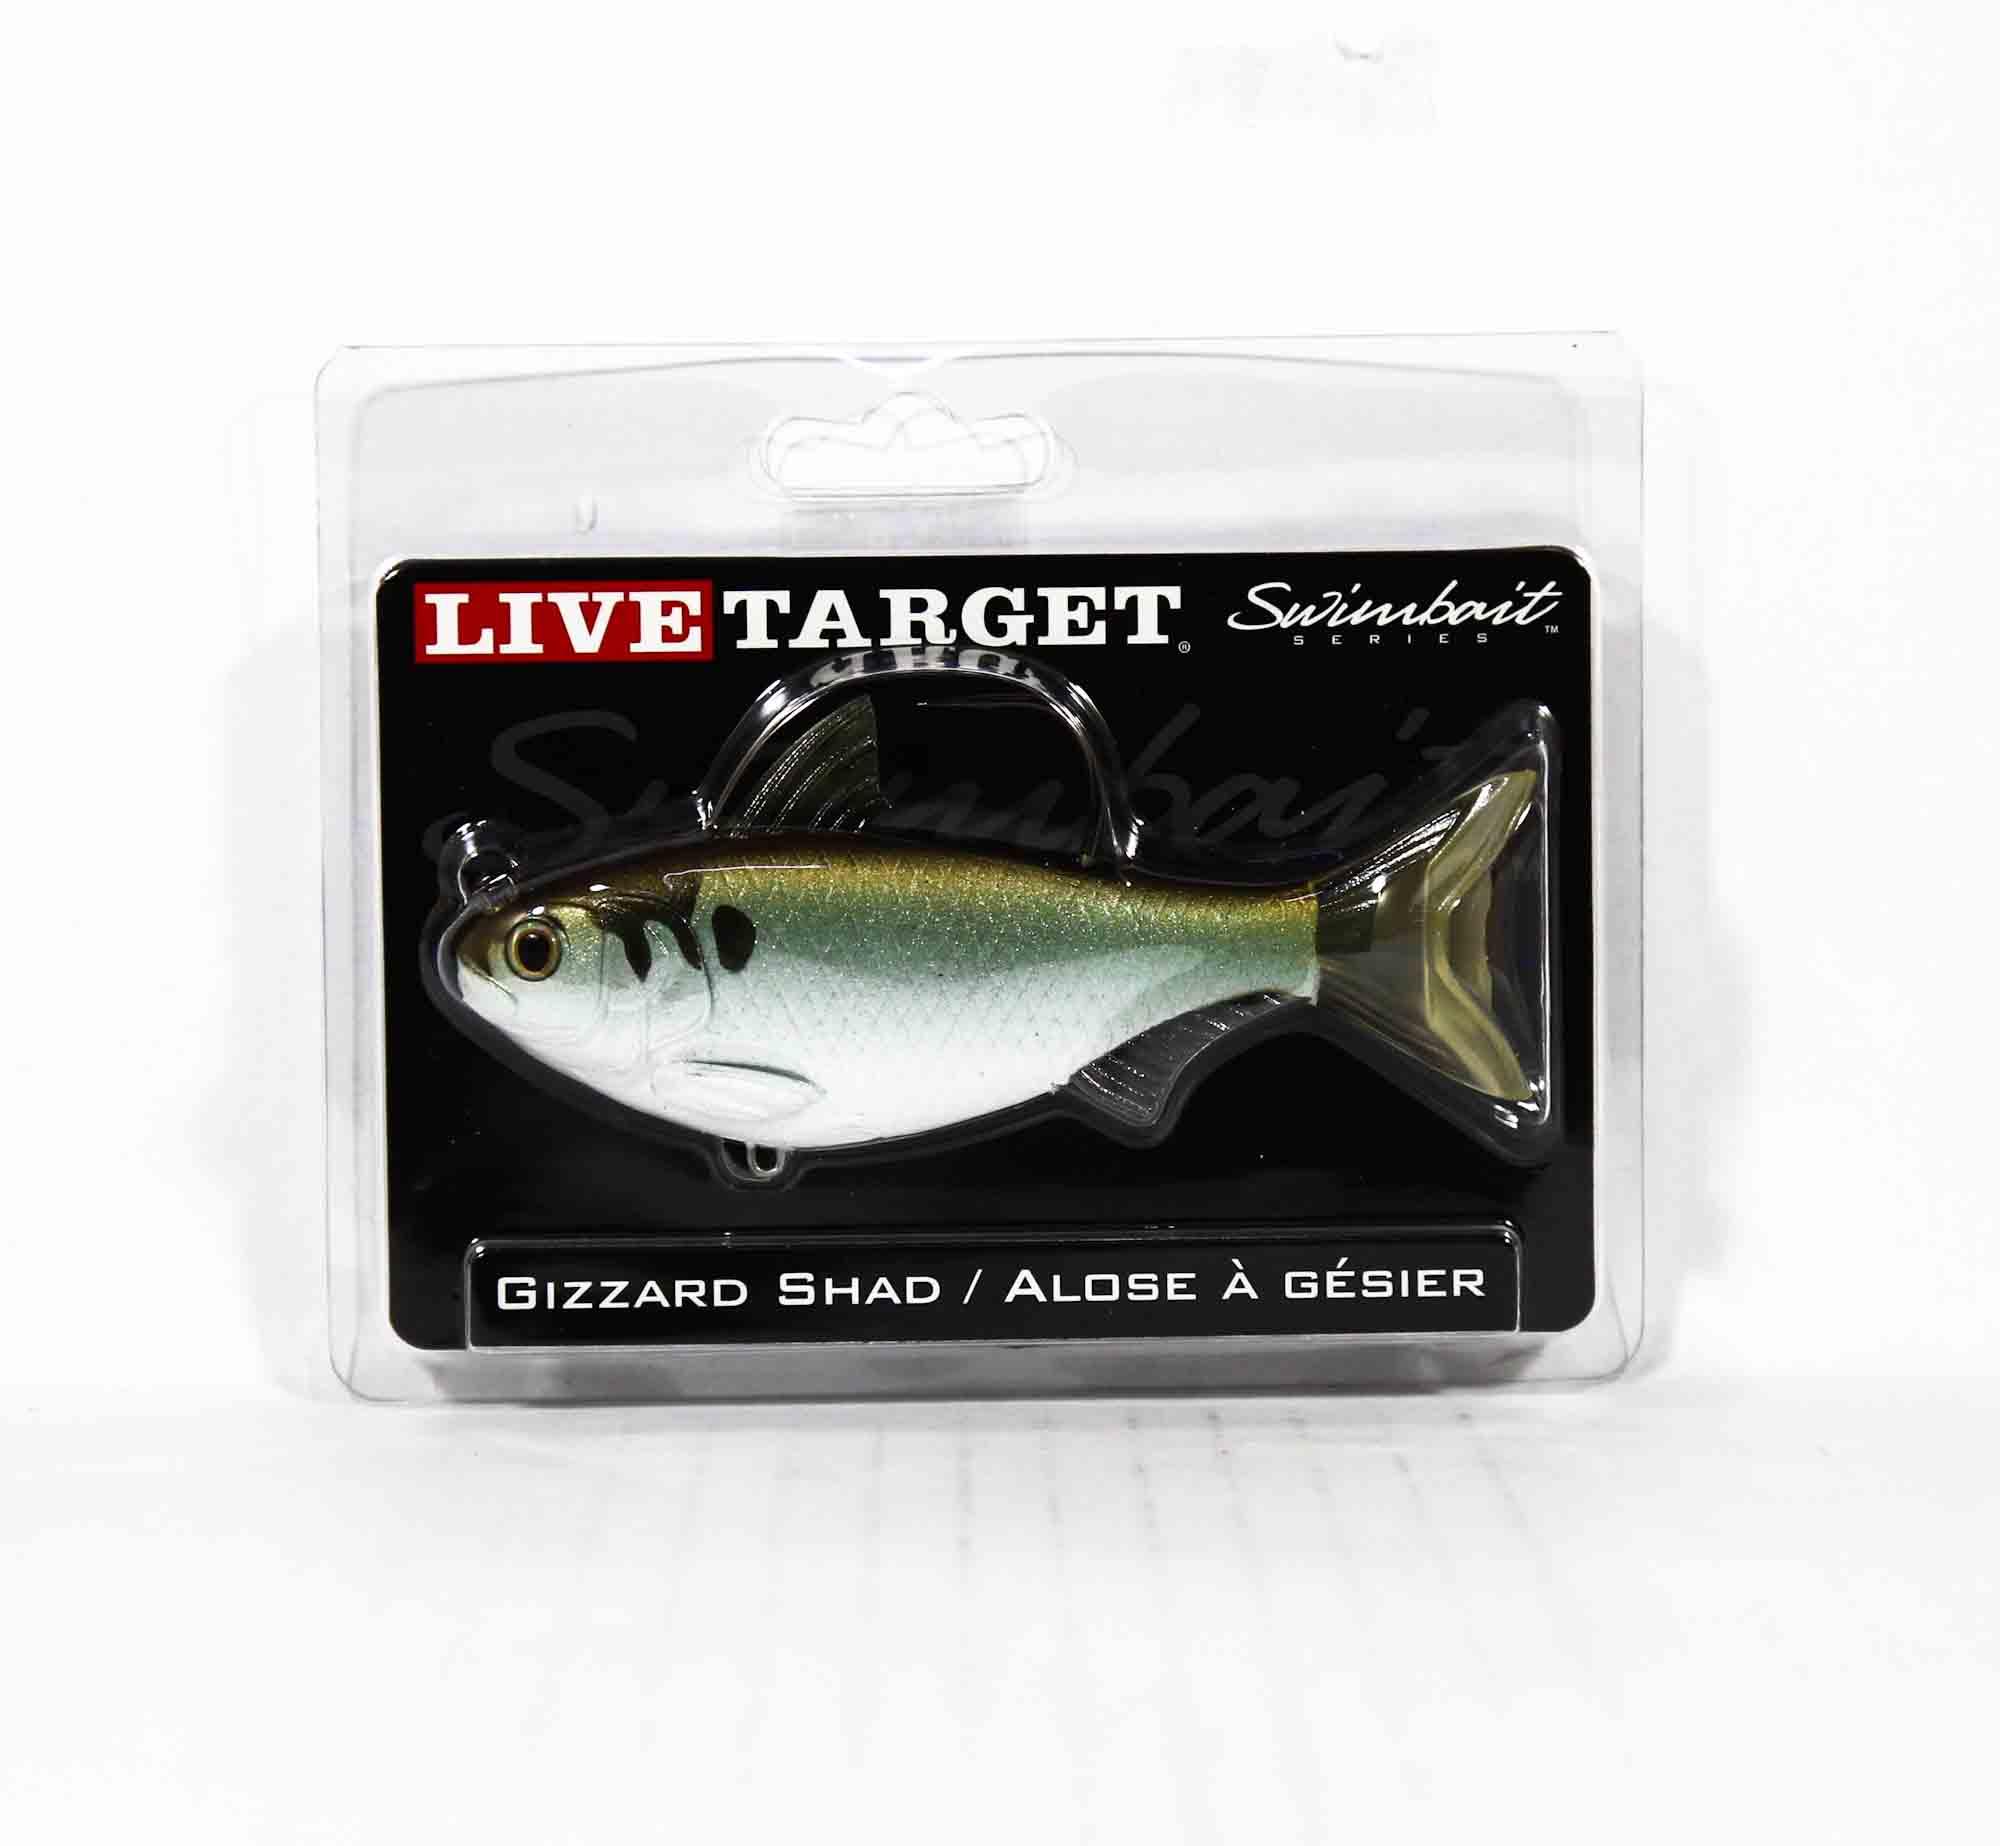 Live Target GZS112MS703 Swimbait Gizzard Shad 4.5 Inch Green Bronze (9358)